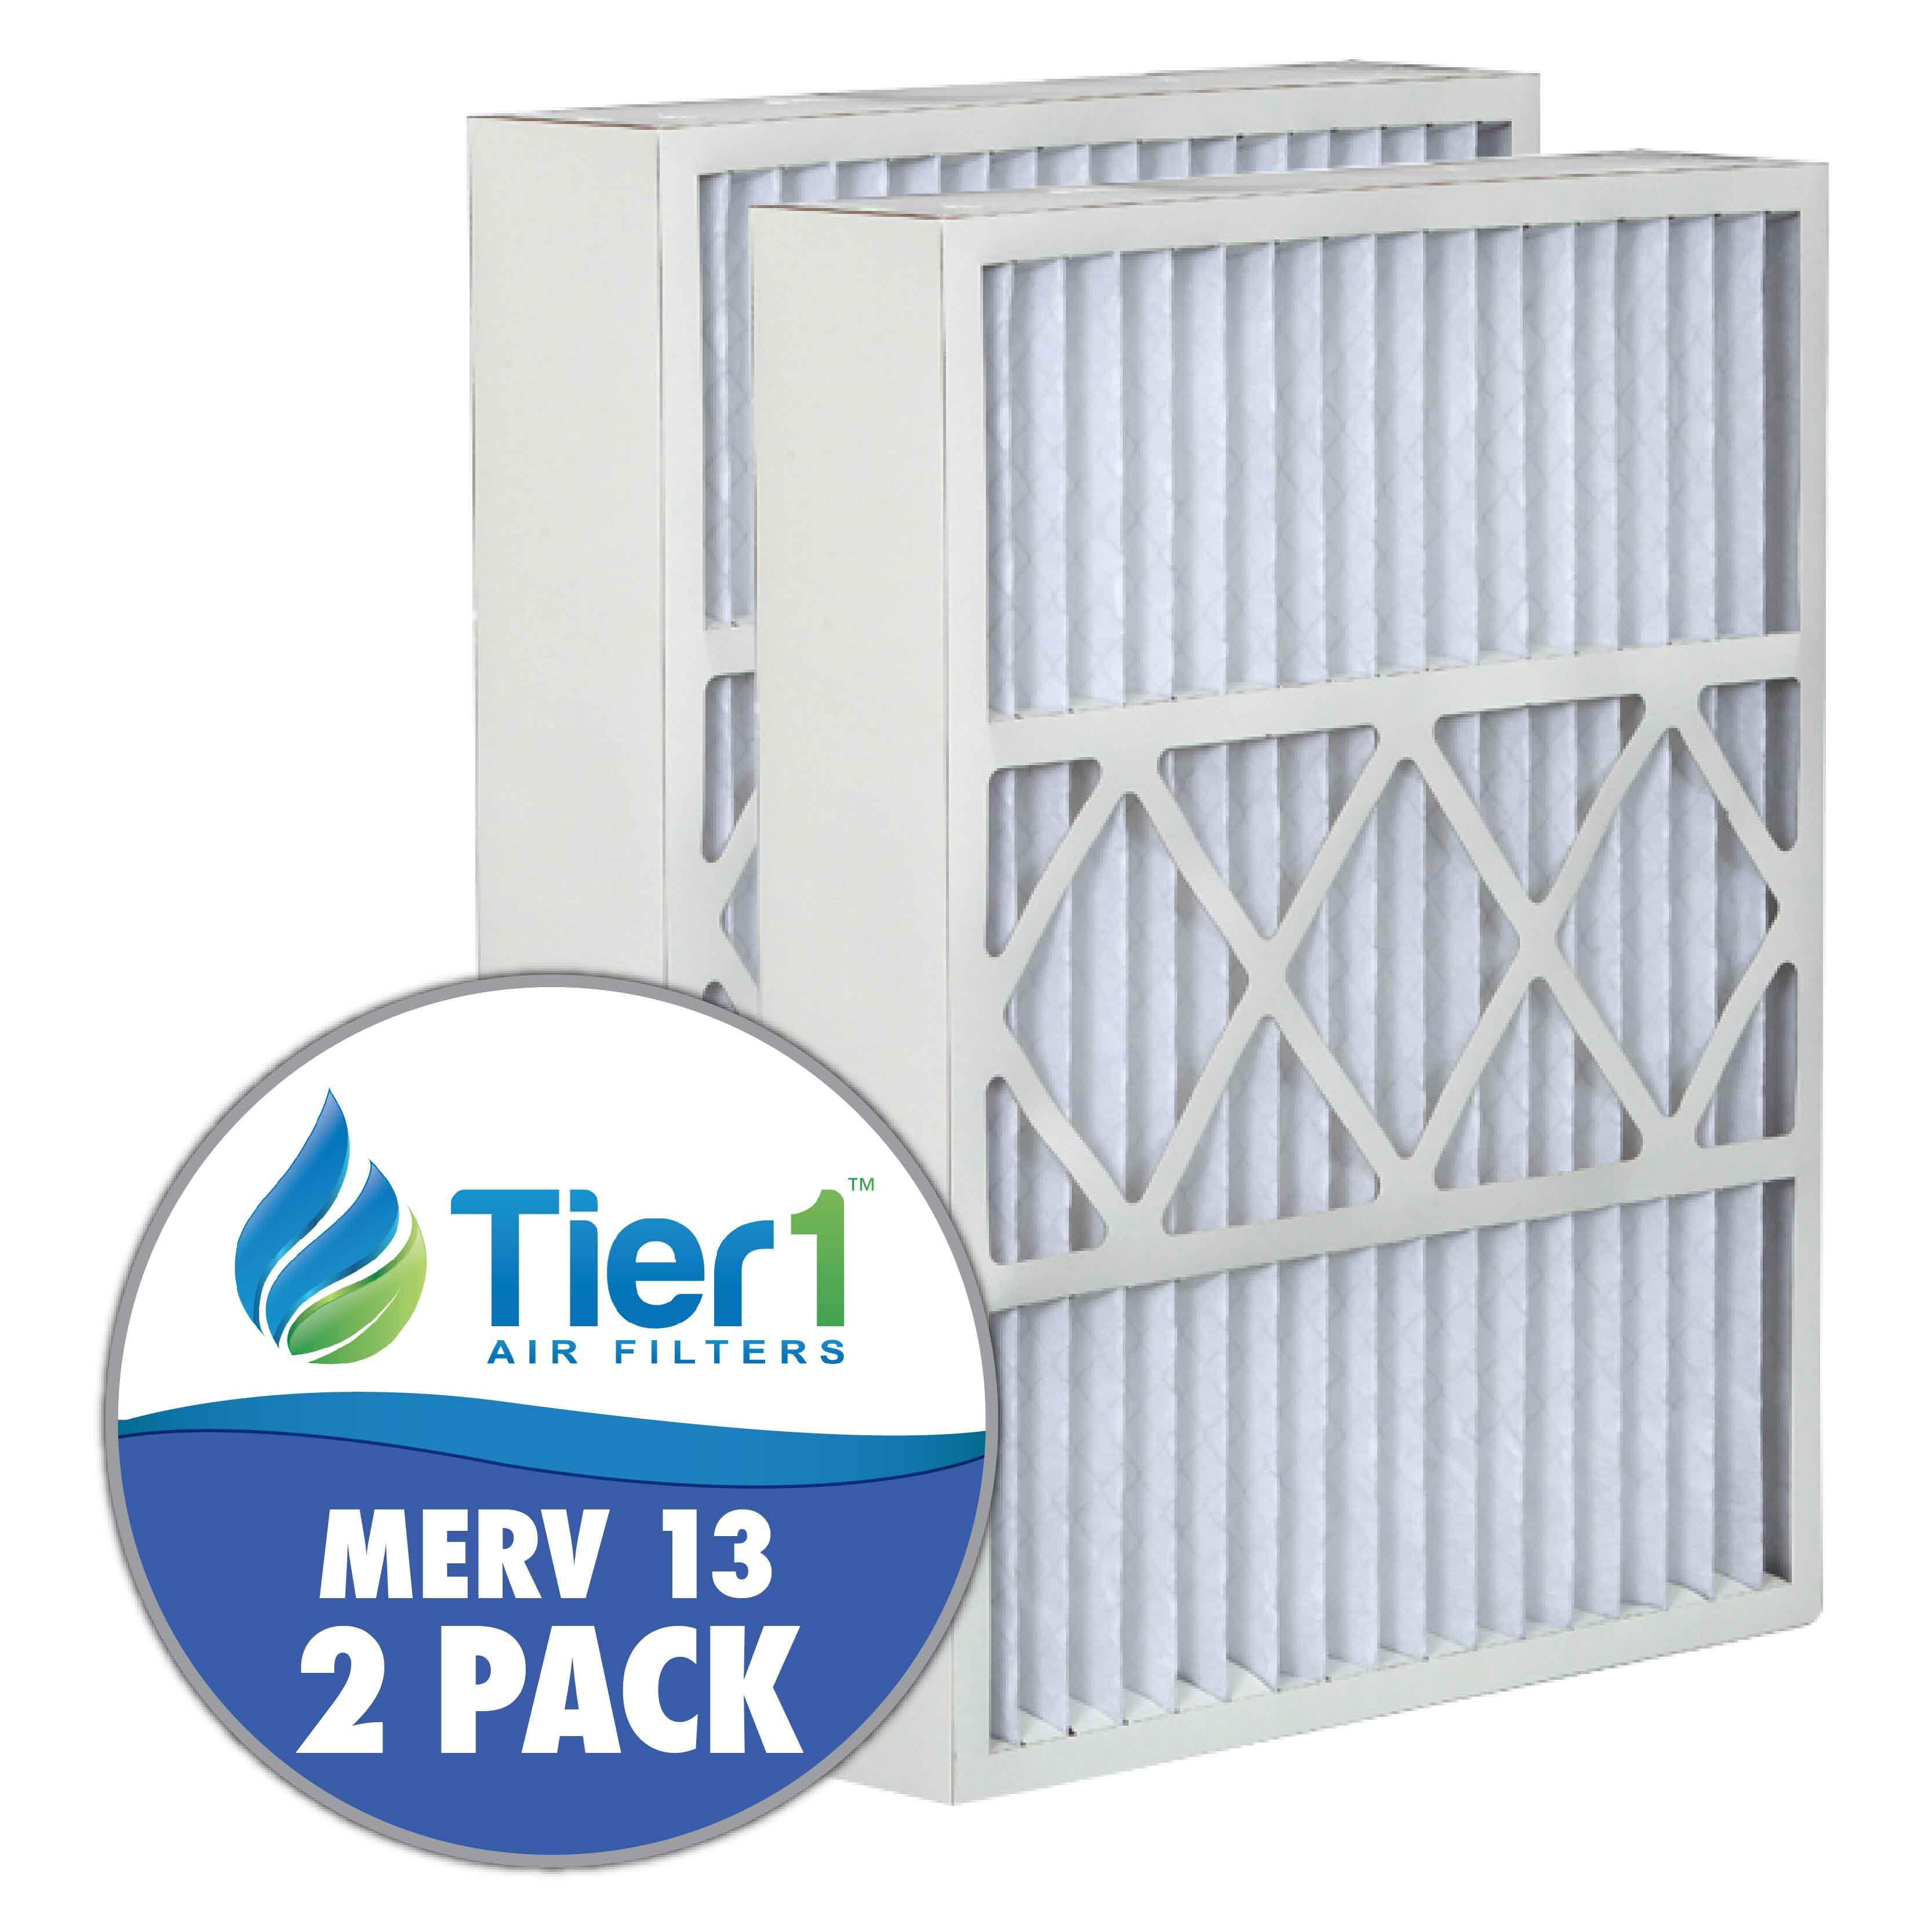 Honeywell 5-1625-13 16x25x5 Merv 13 Replacement AC Furnace Air Filter (2 Pack)